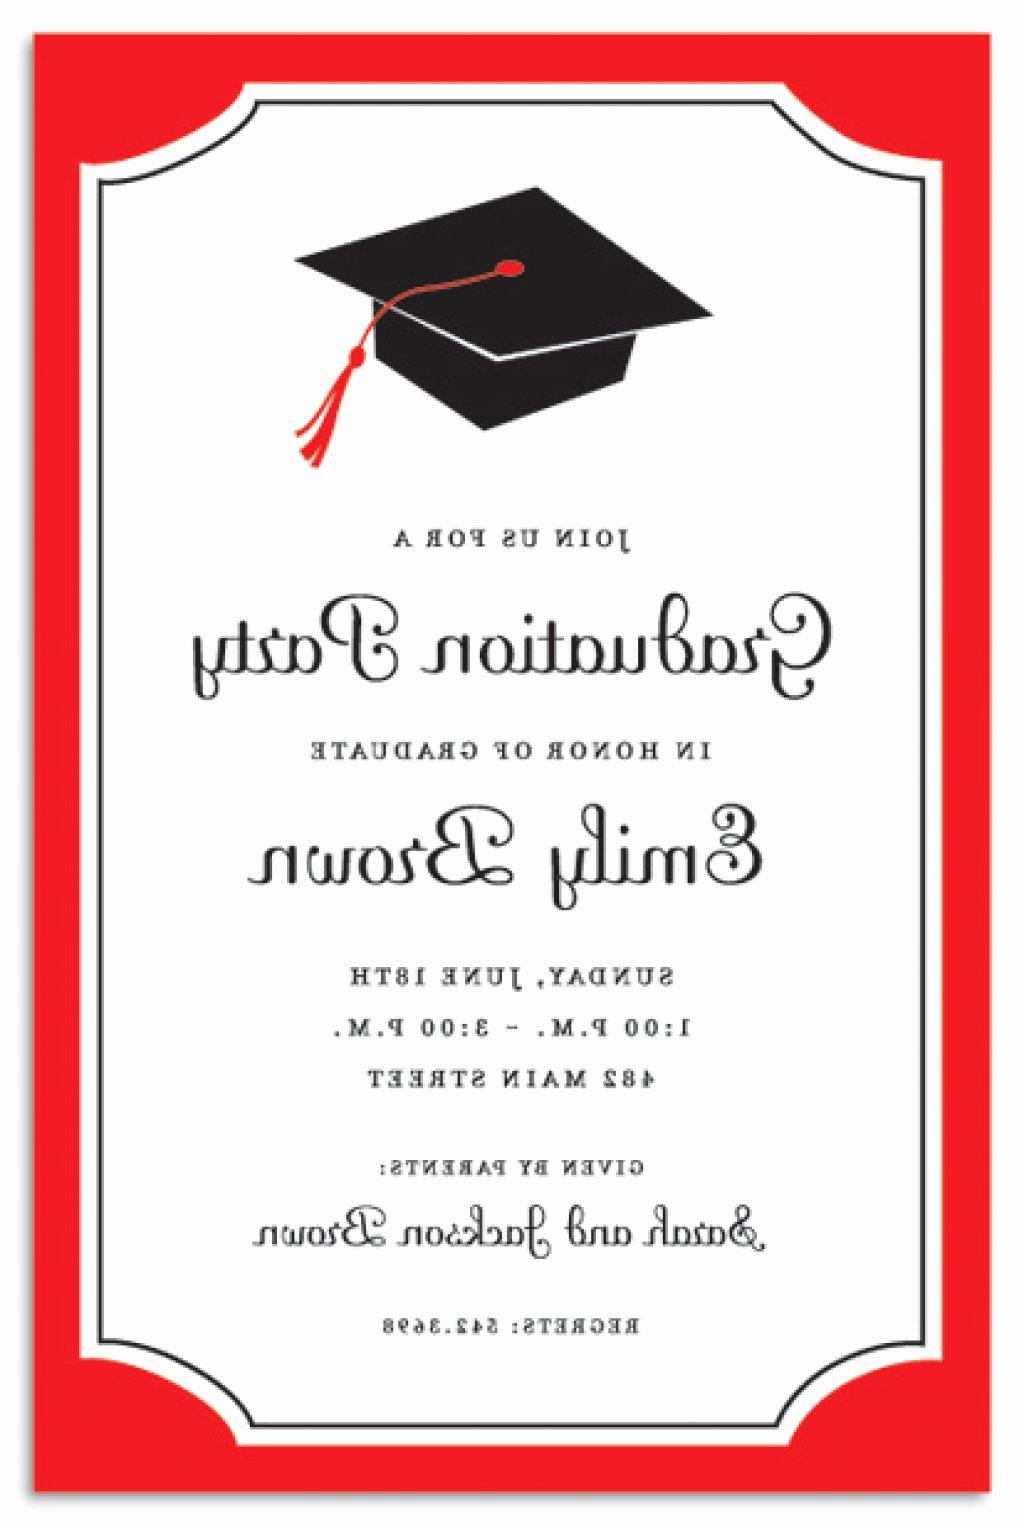 Graduation Invitation Card Template Inspirational Graduation Ceremony Invitation Template